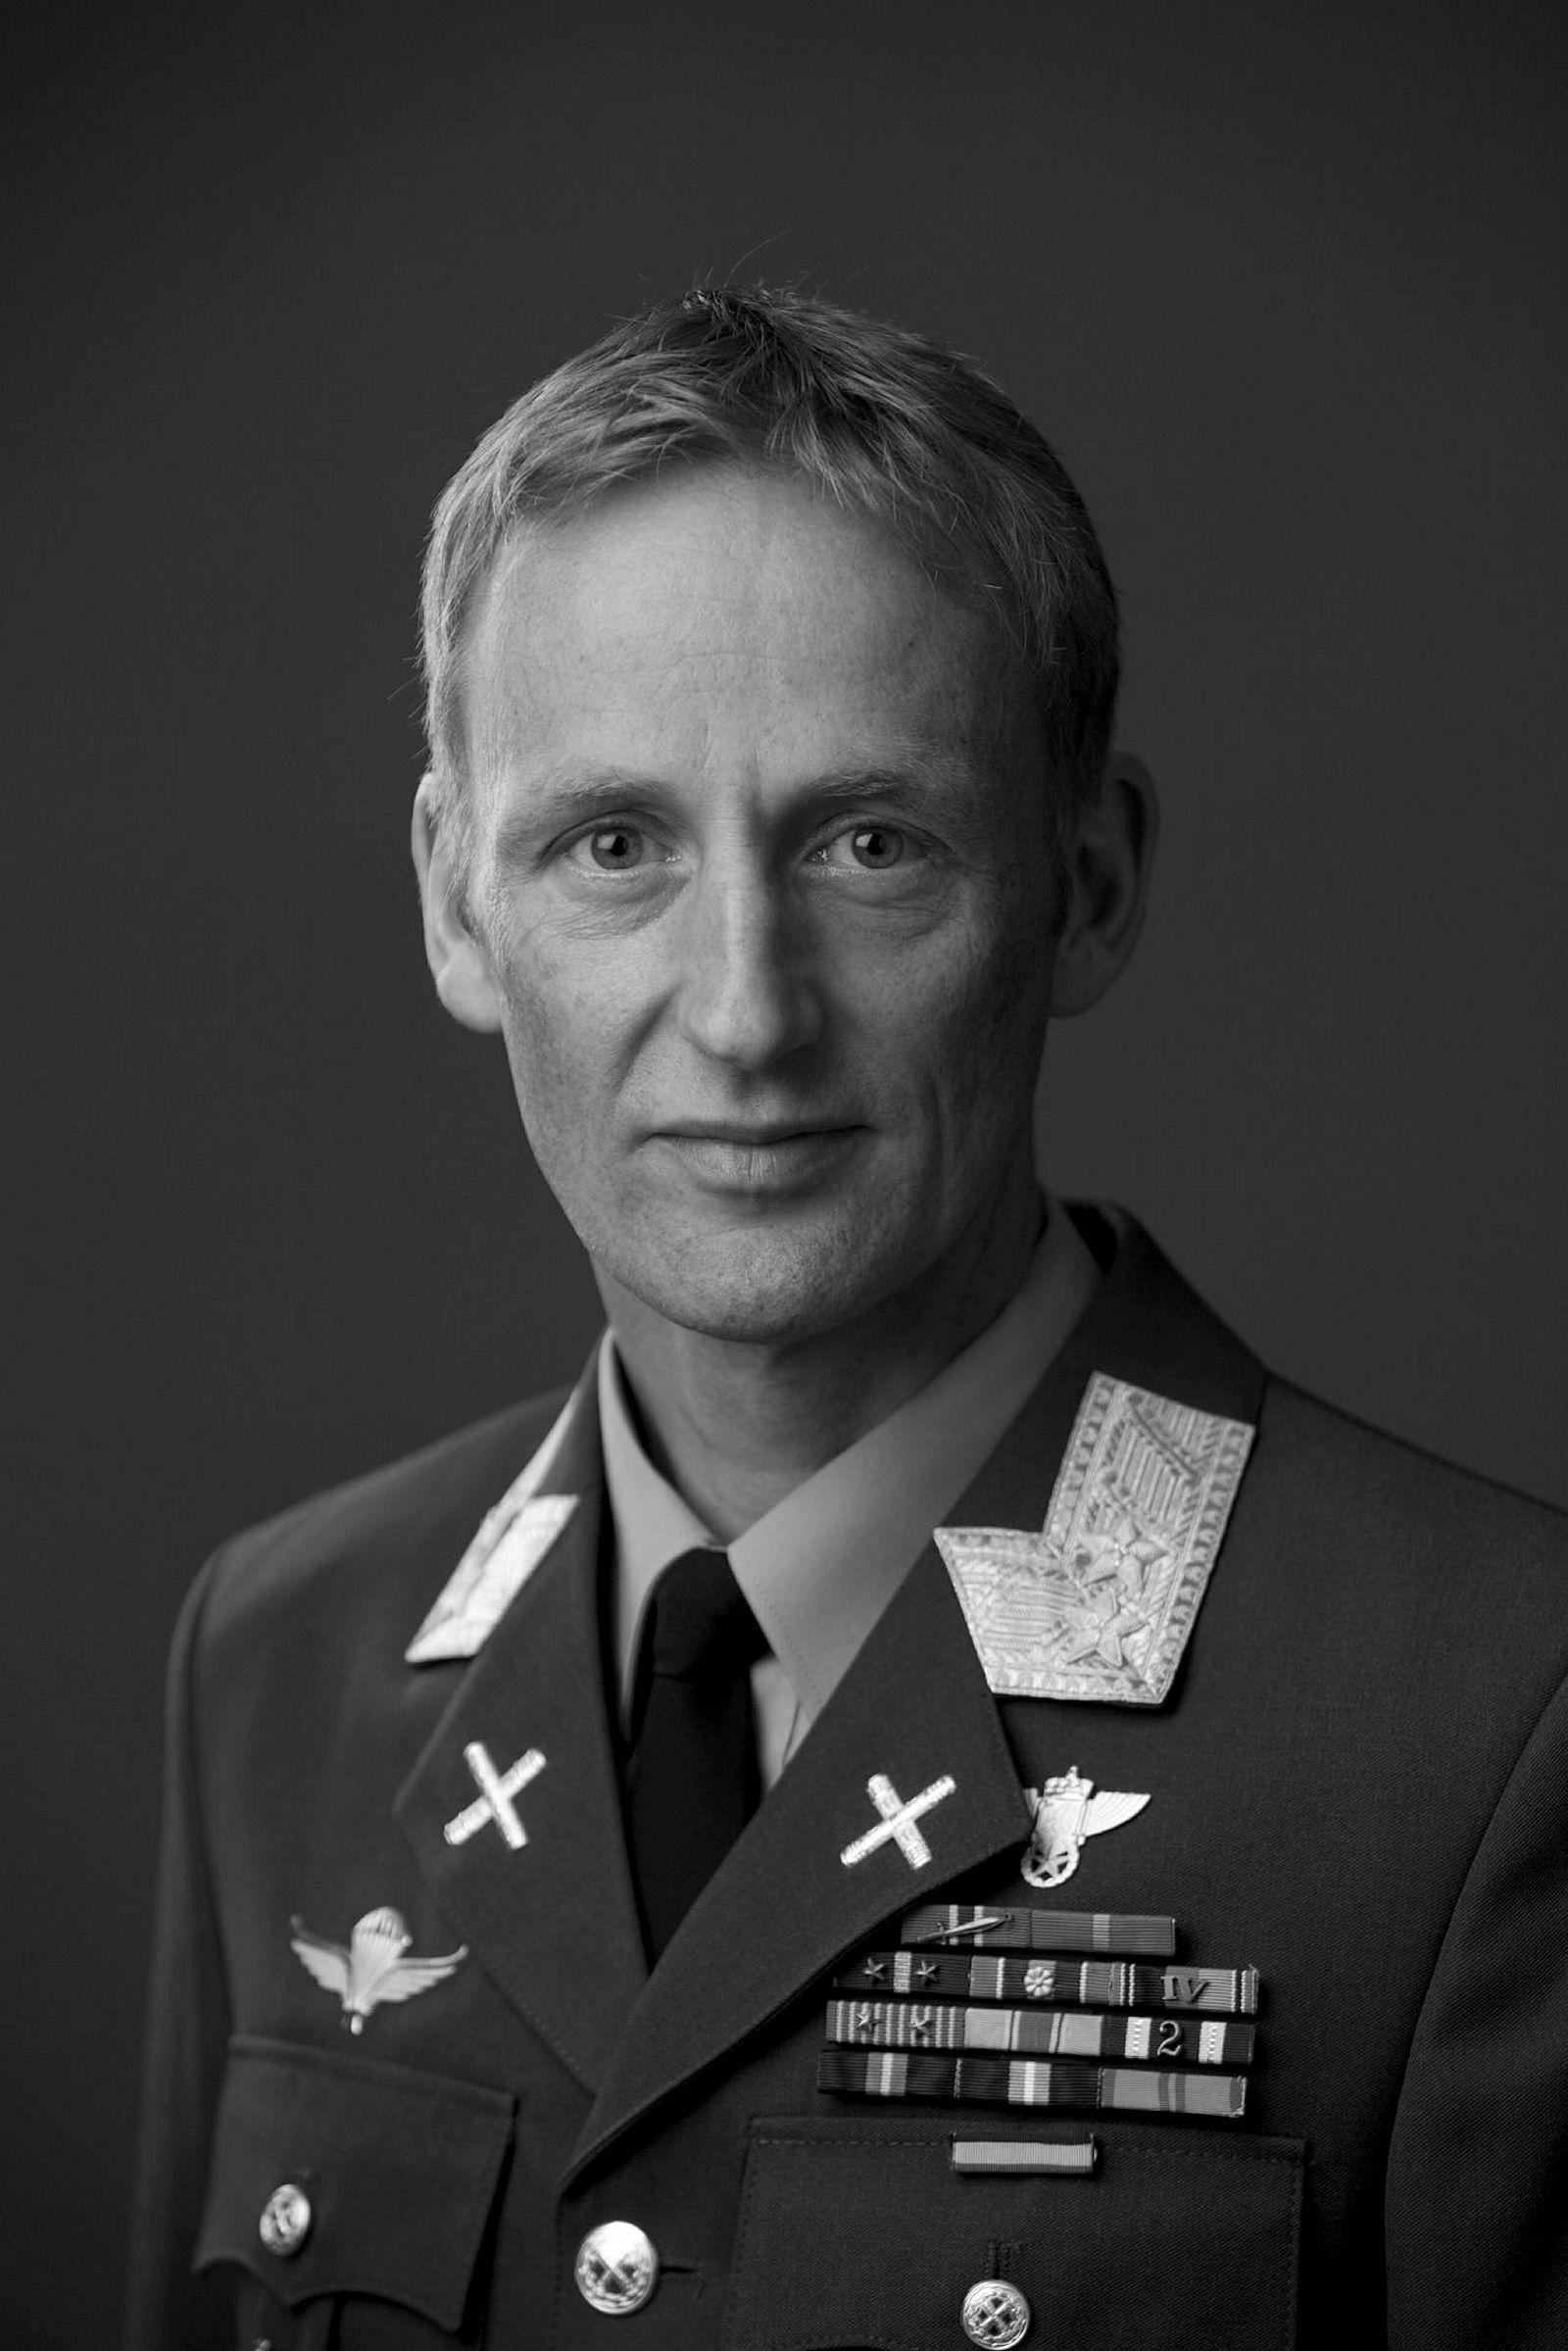 Eirik Johan Kristoffersen